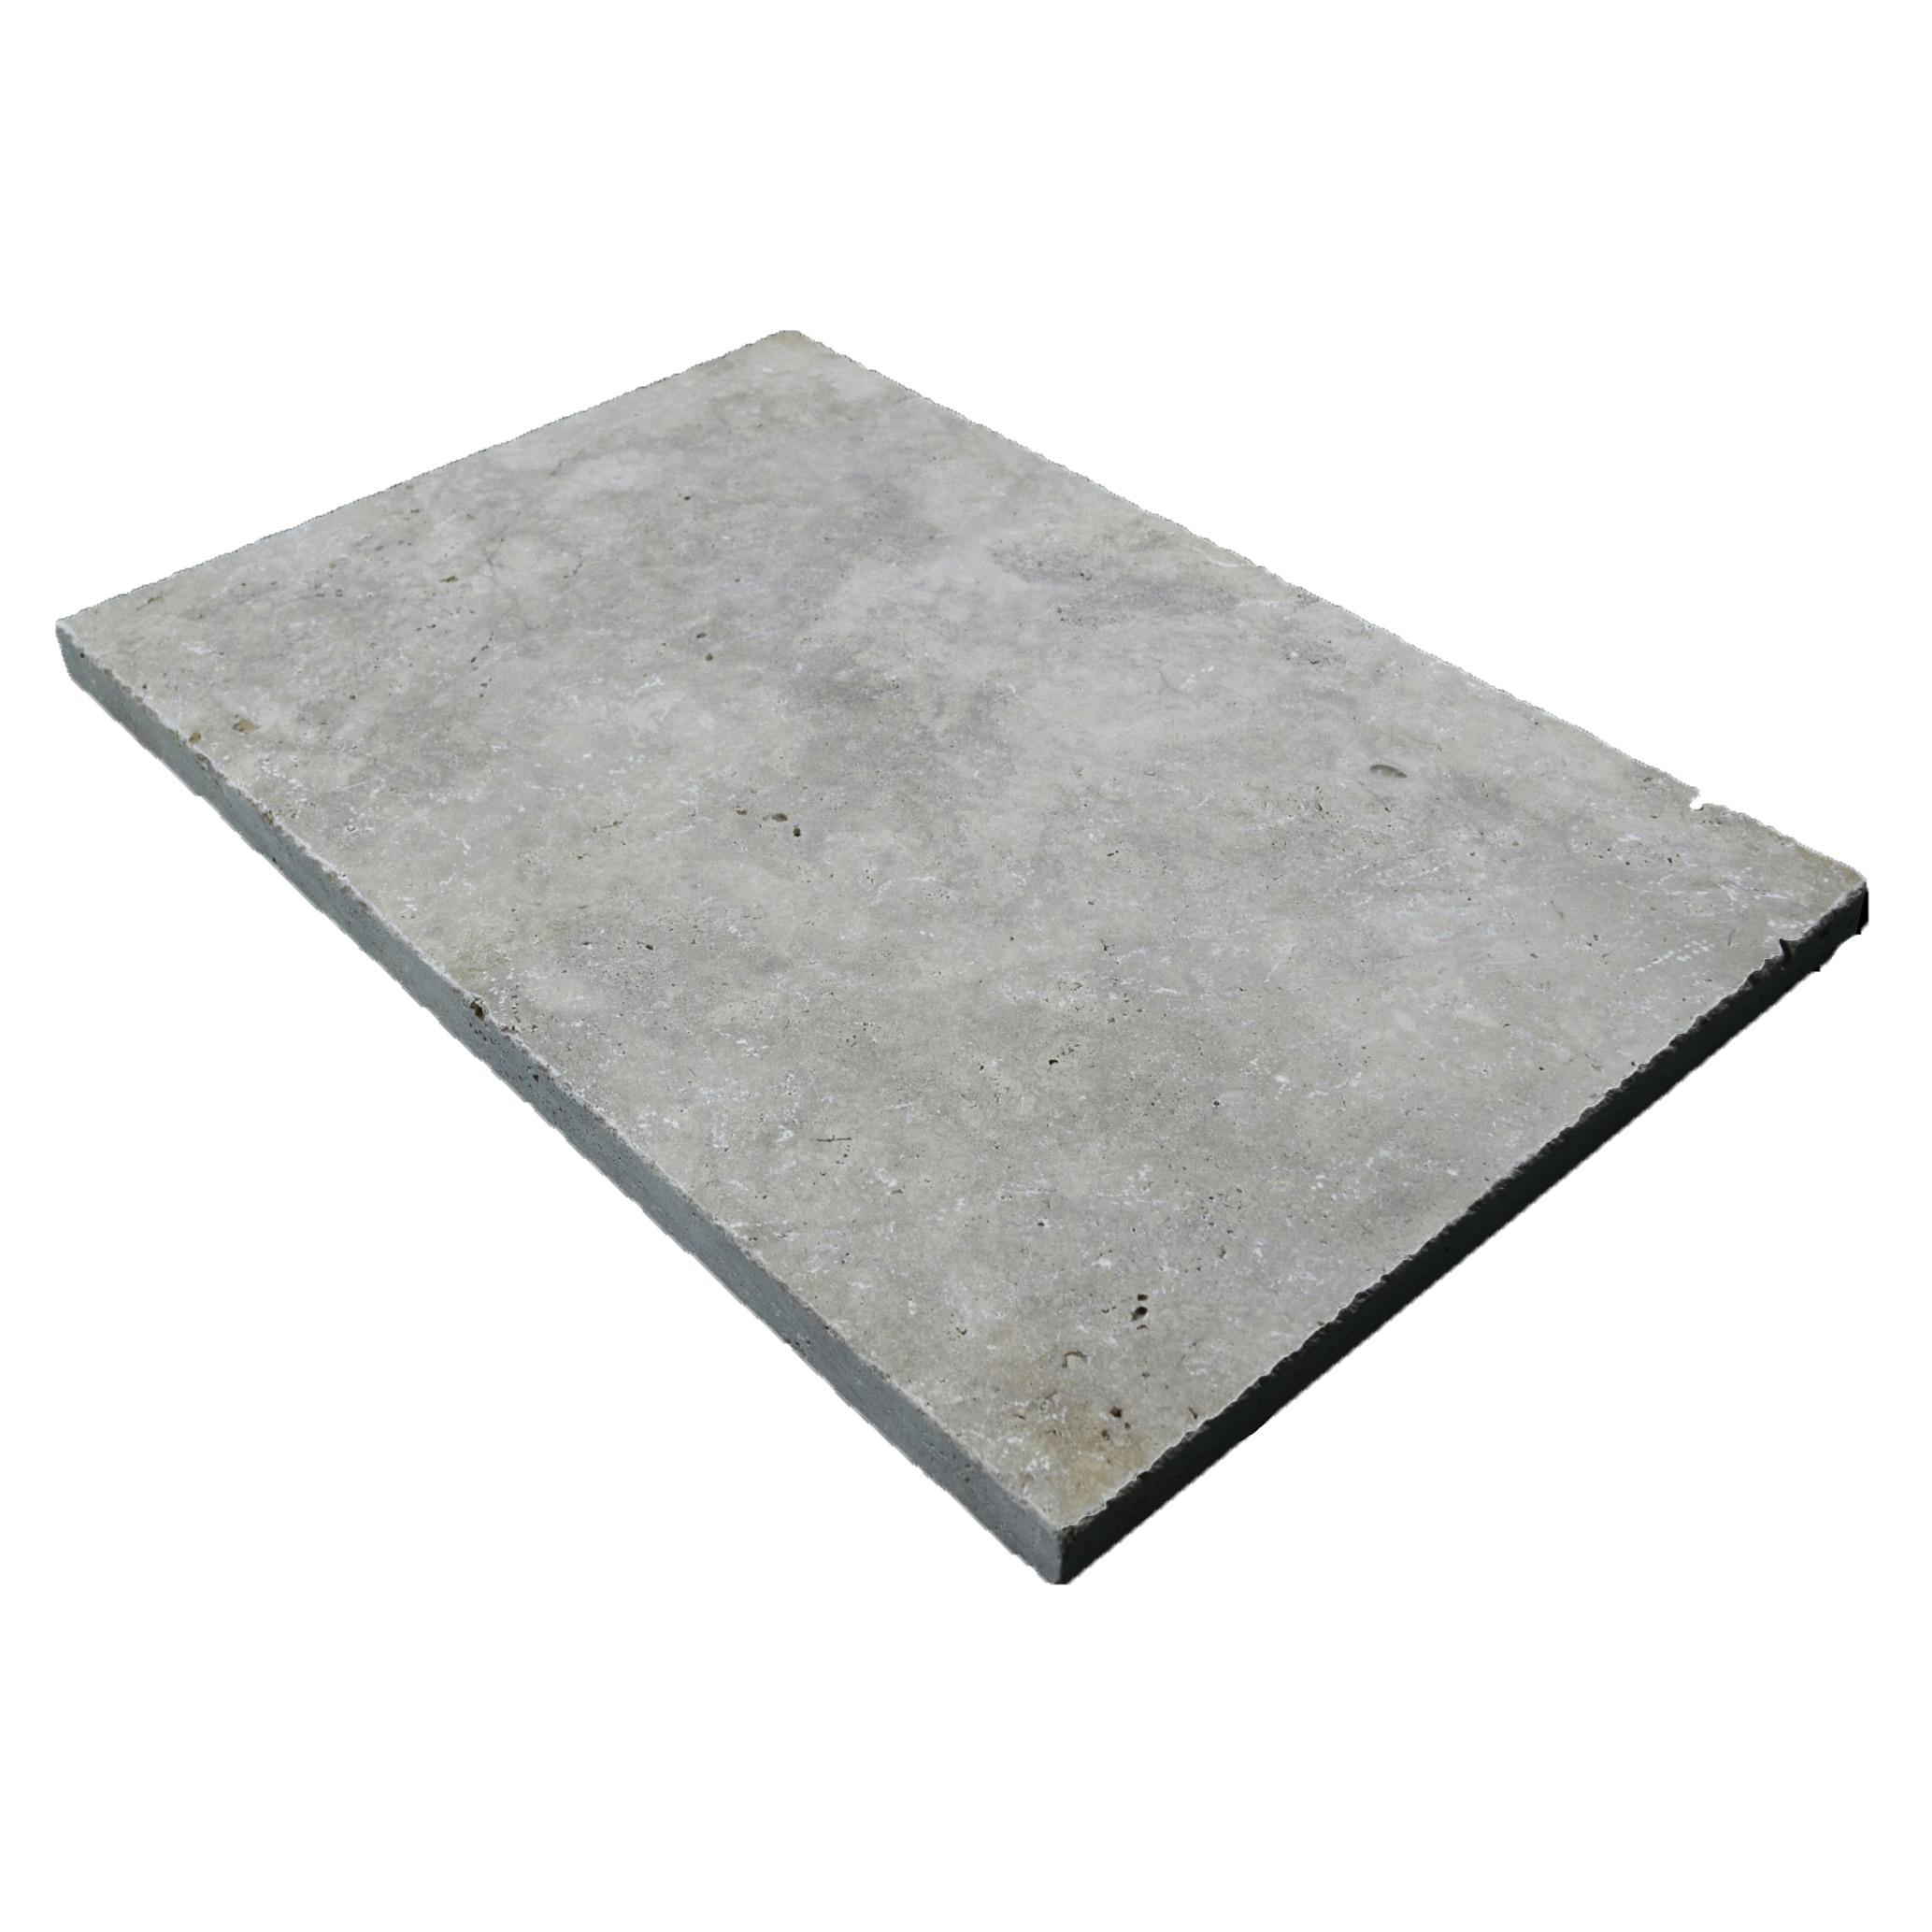 Walnut Tumbled Travertine Pavers 16x24-pavers sale-Atlantic Stone Source